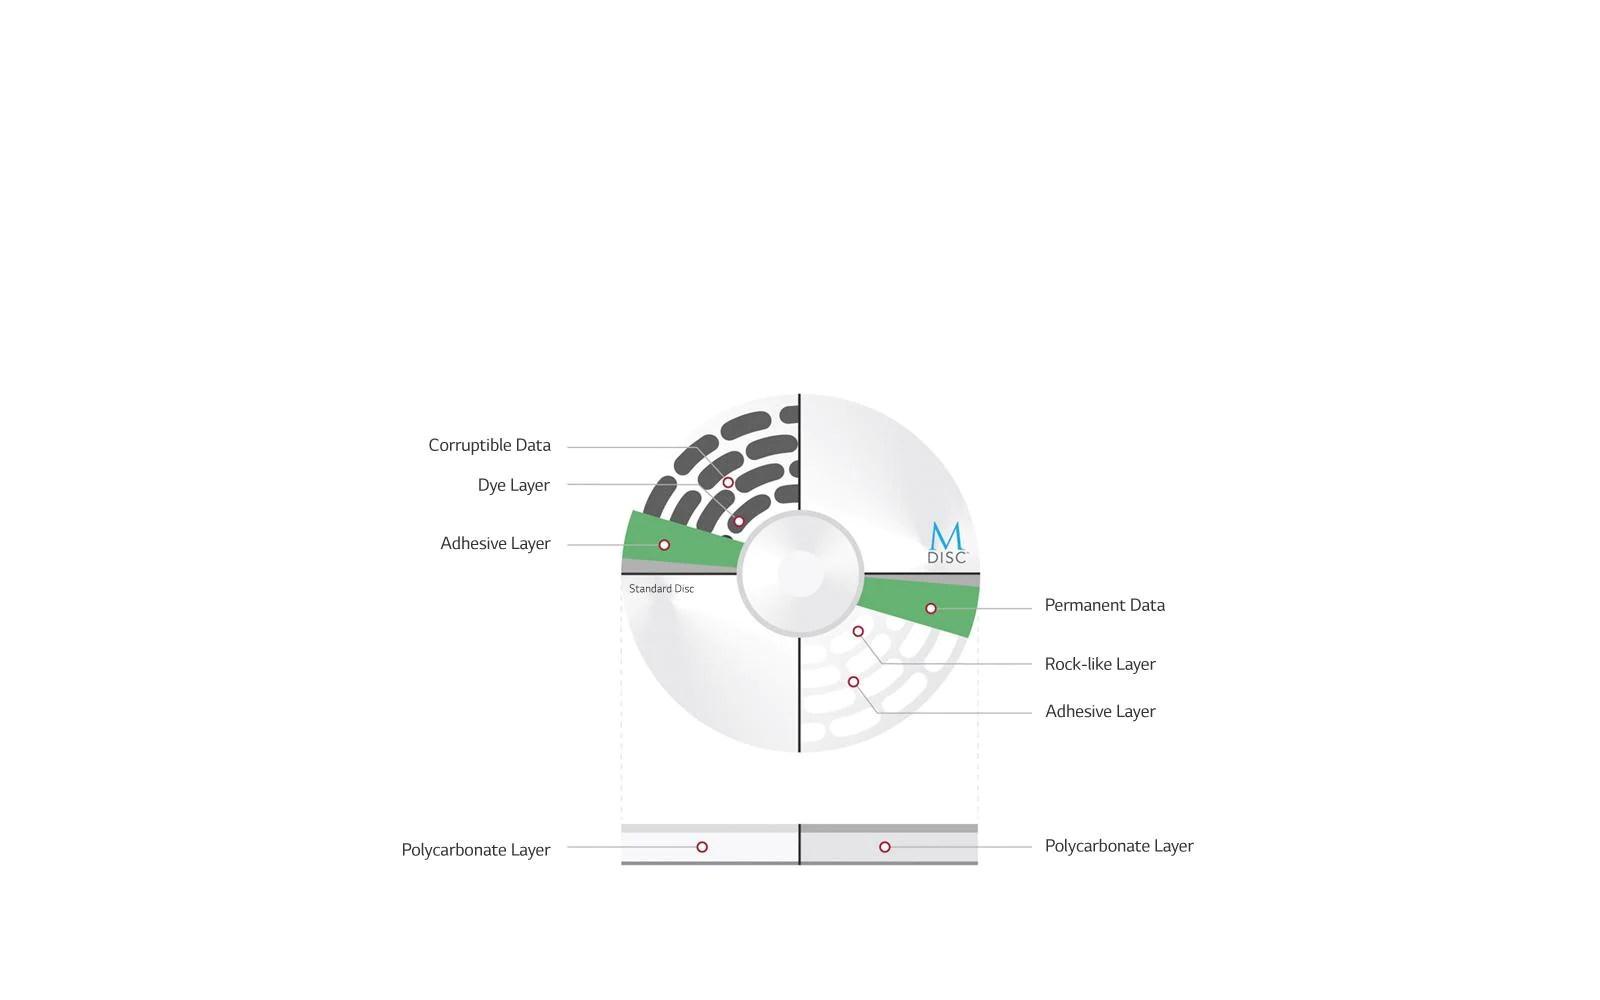 LG Internal Blu-ray Drive Ultra HD Blu-Ray Playback & M